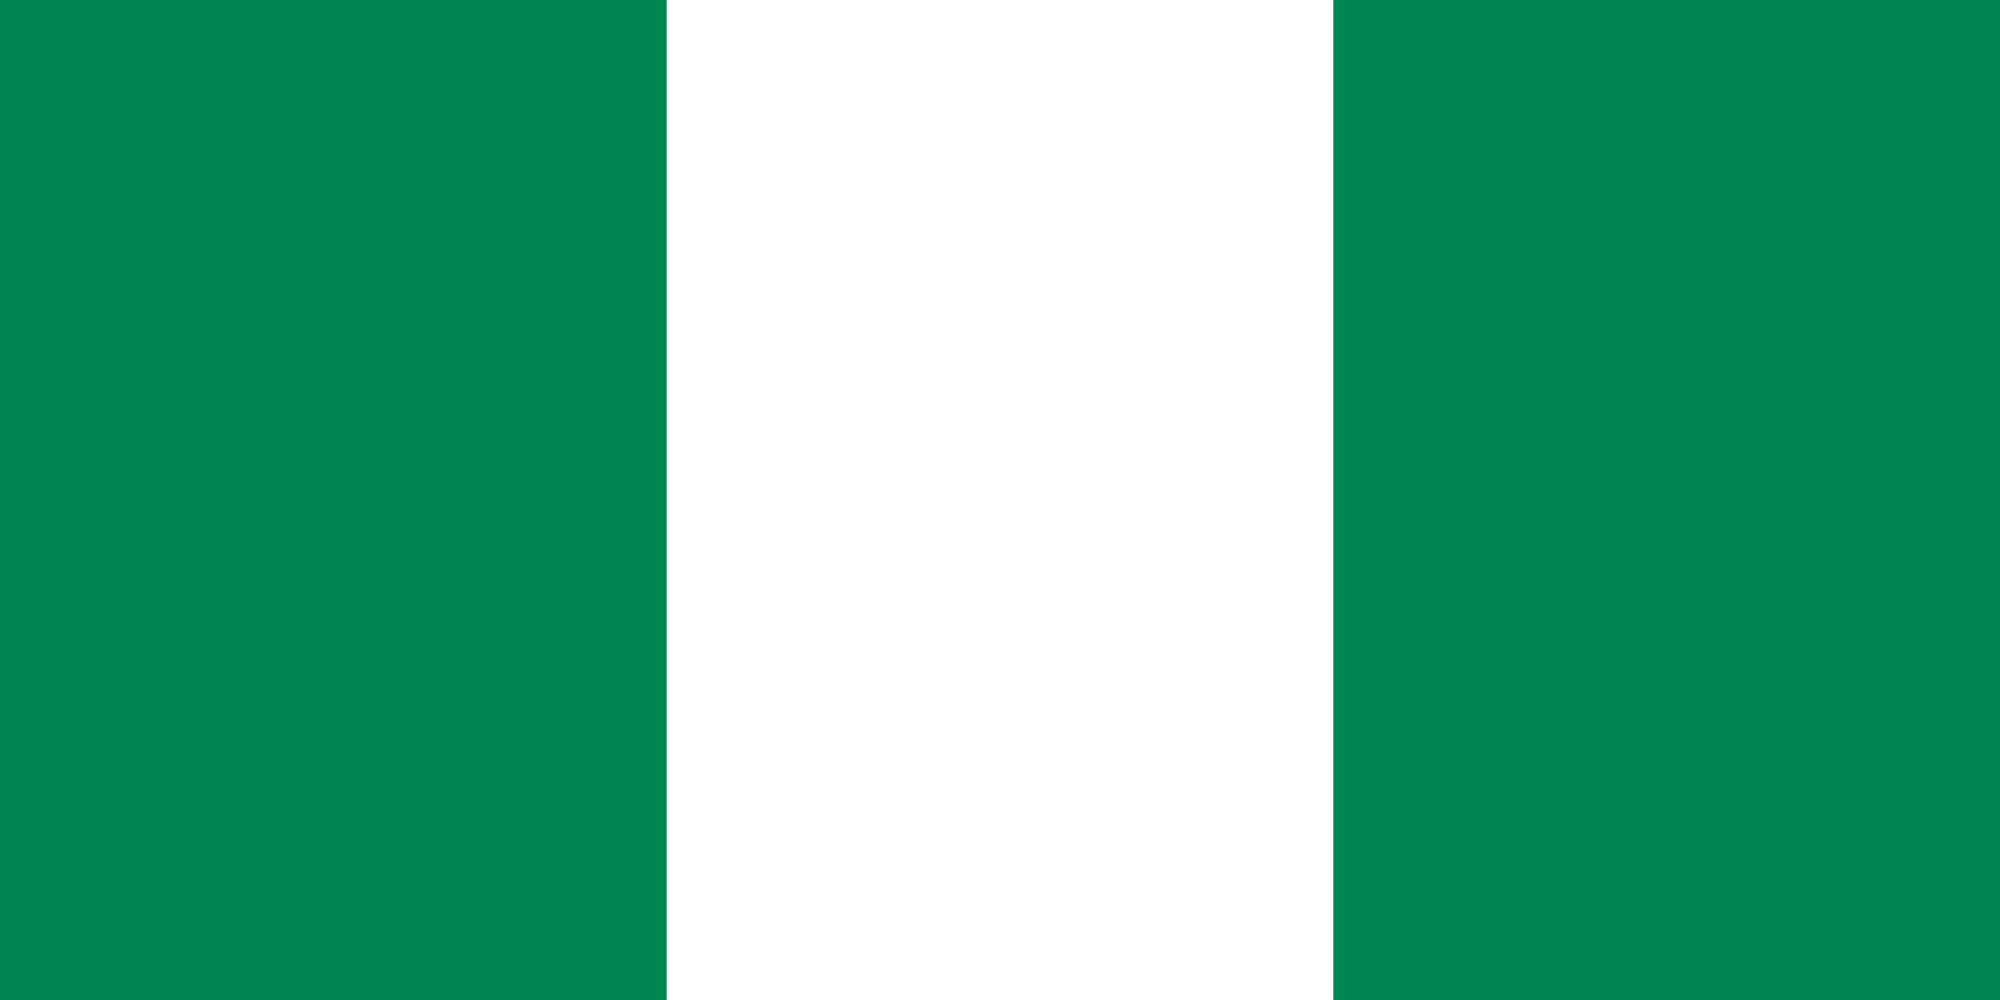 NIGERIA MILITARY BLOG